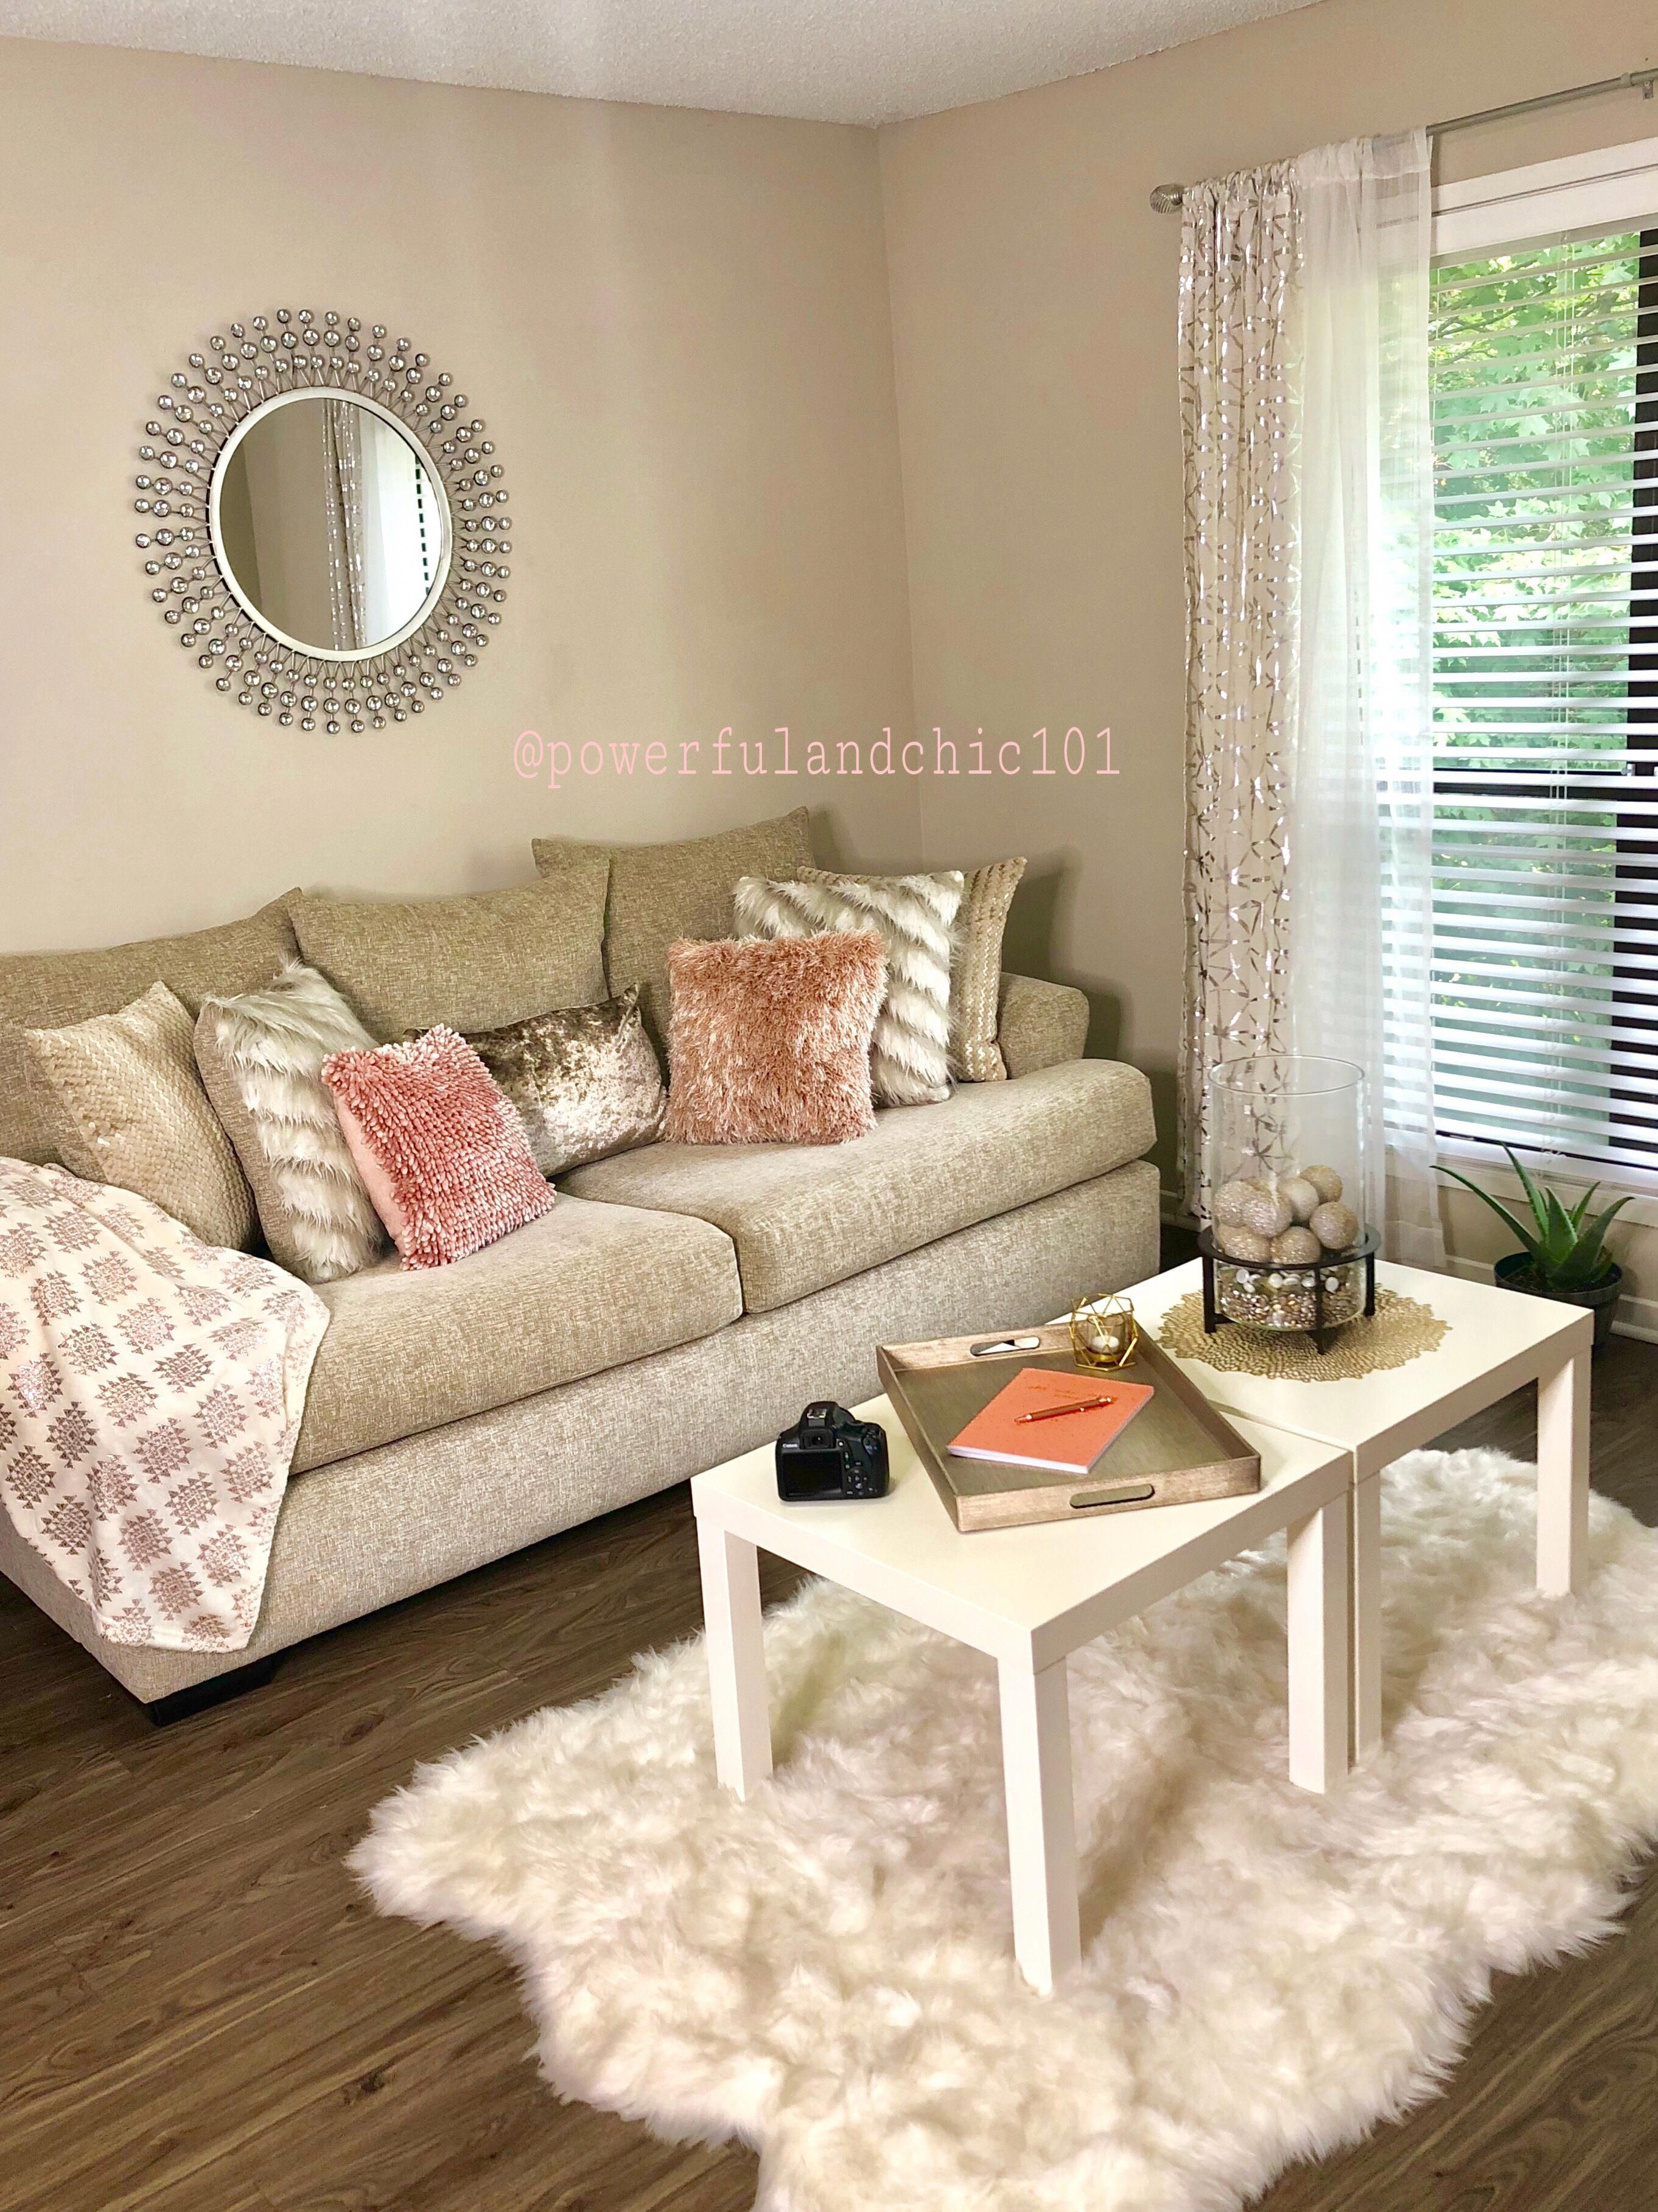 Blush Pink Gold White And Cream Living Room Decor Decor Decorideas Apartments Diyhomedecor Gold Living Room Decor Gold Living Room Pink Living Room Decor